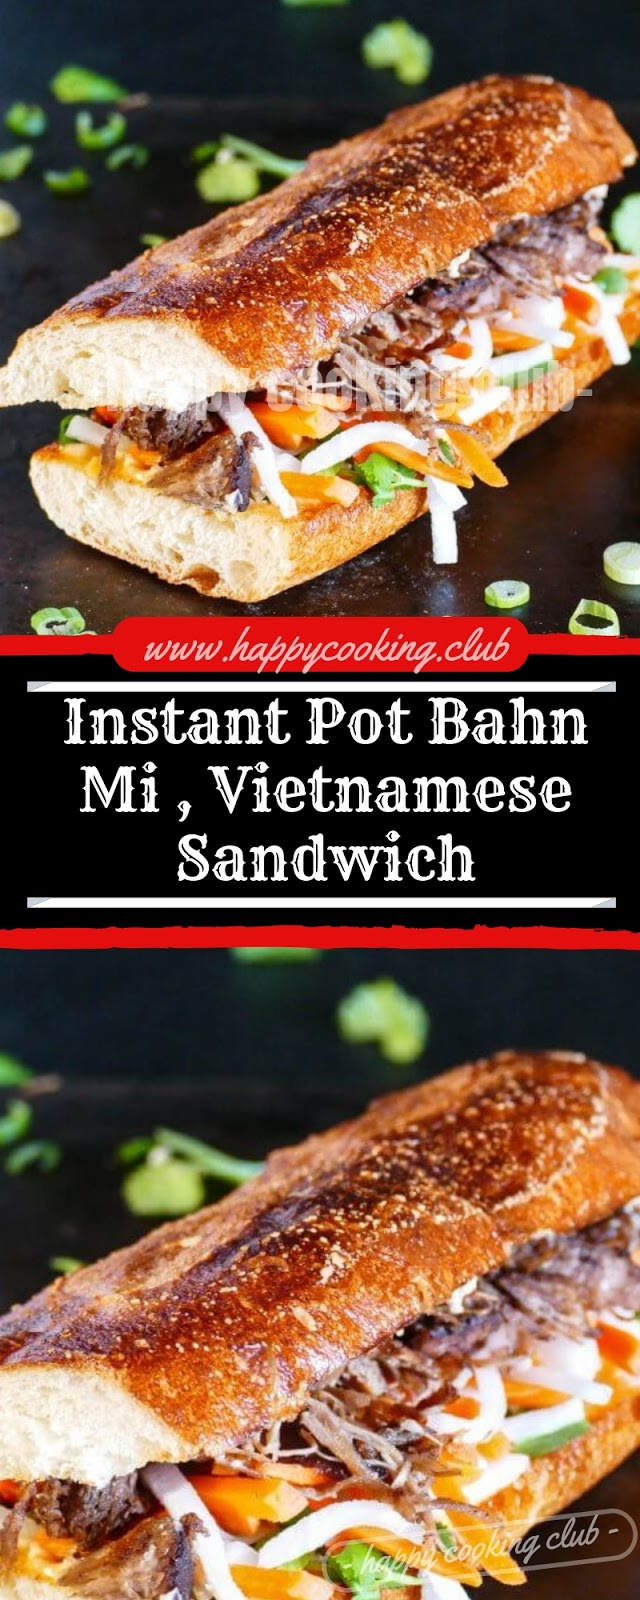 Instant Pot Bahn Mi , Vietnamese Sandwich